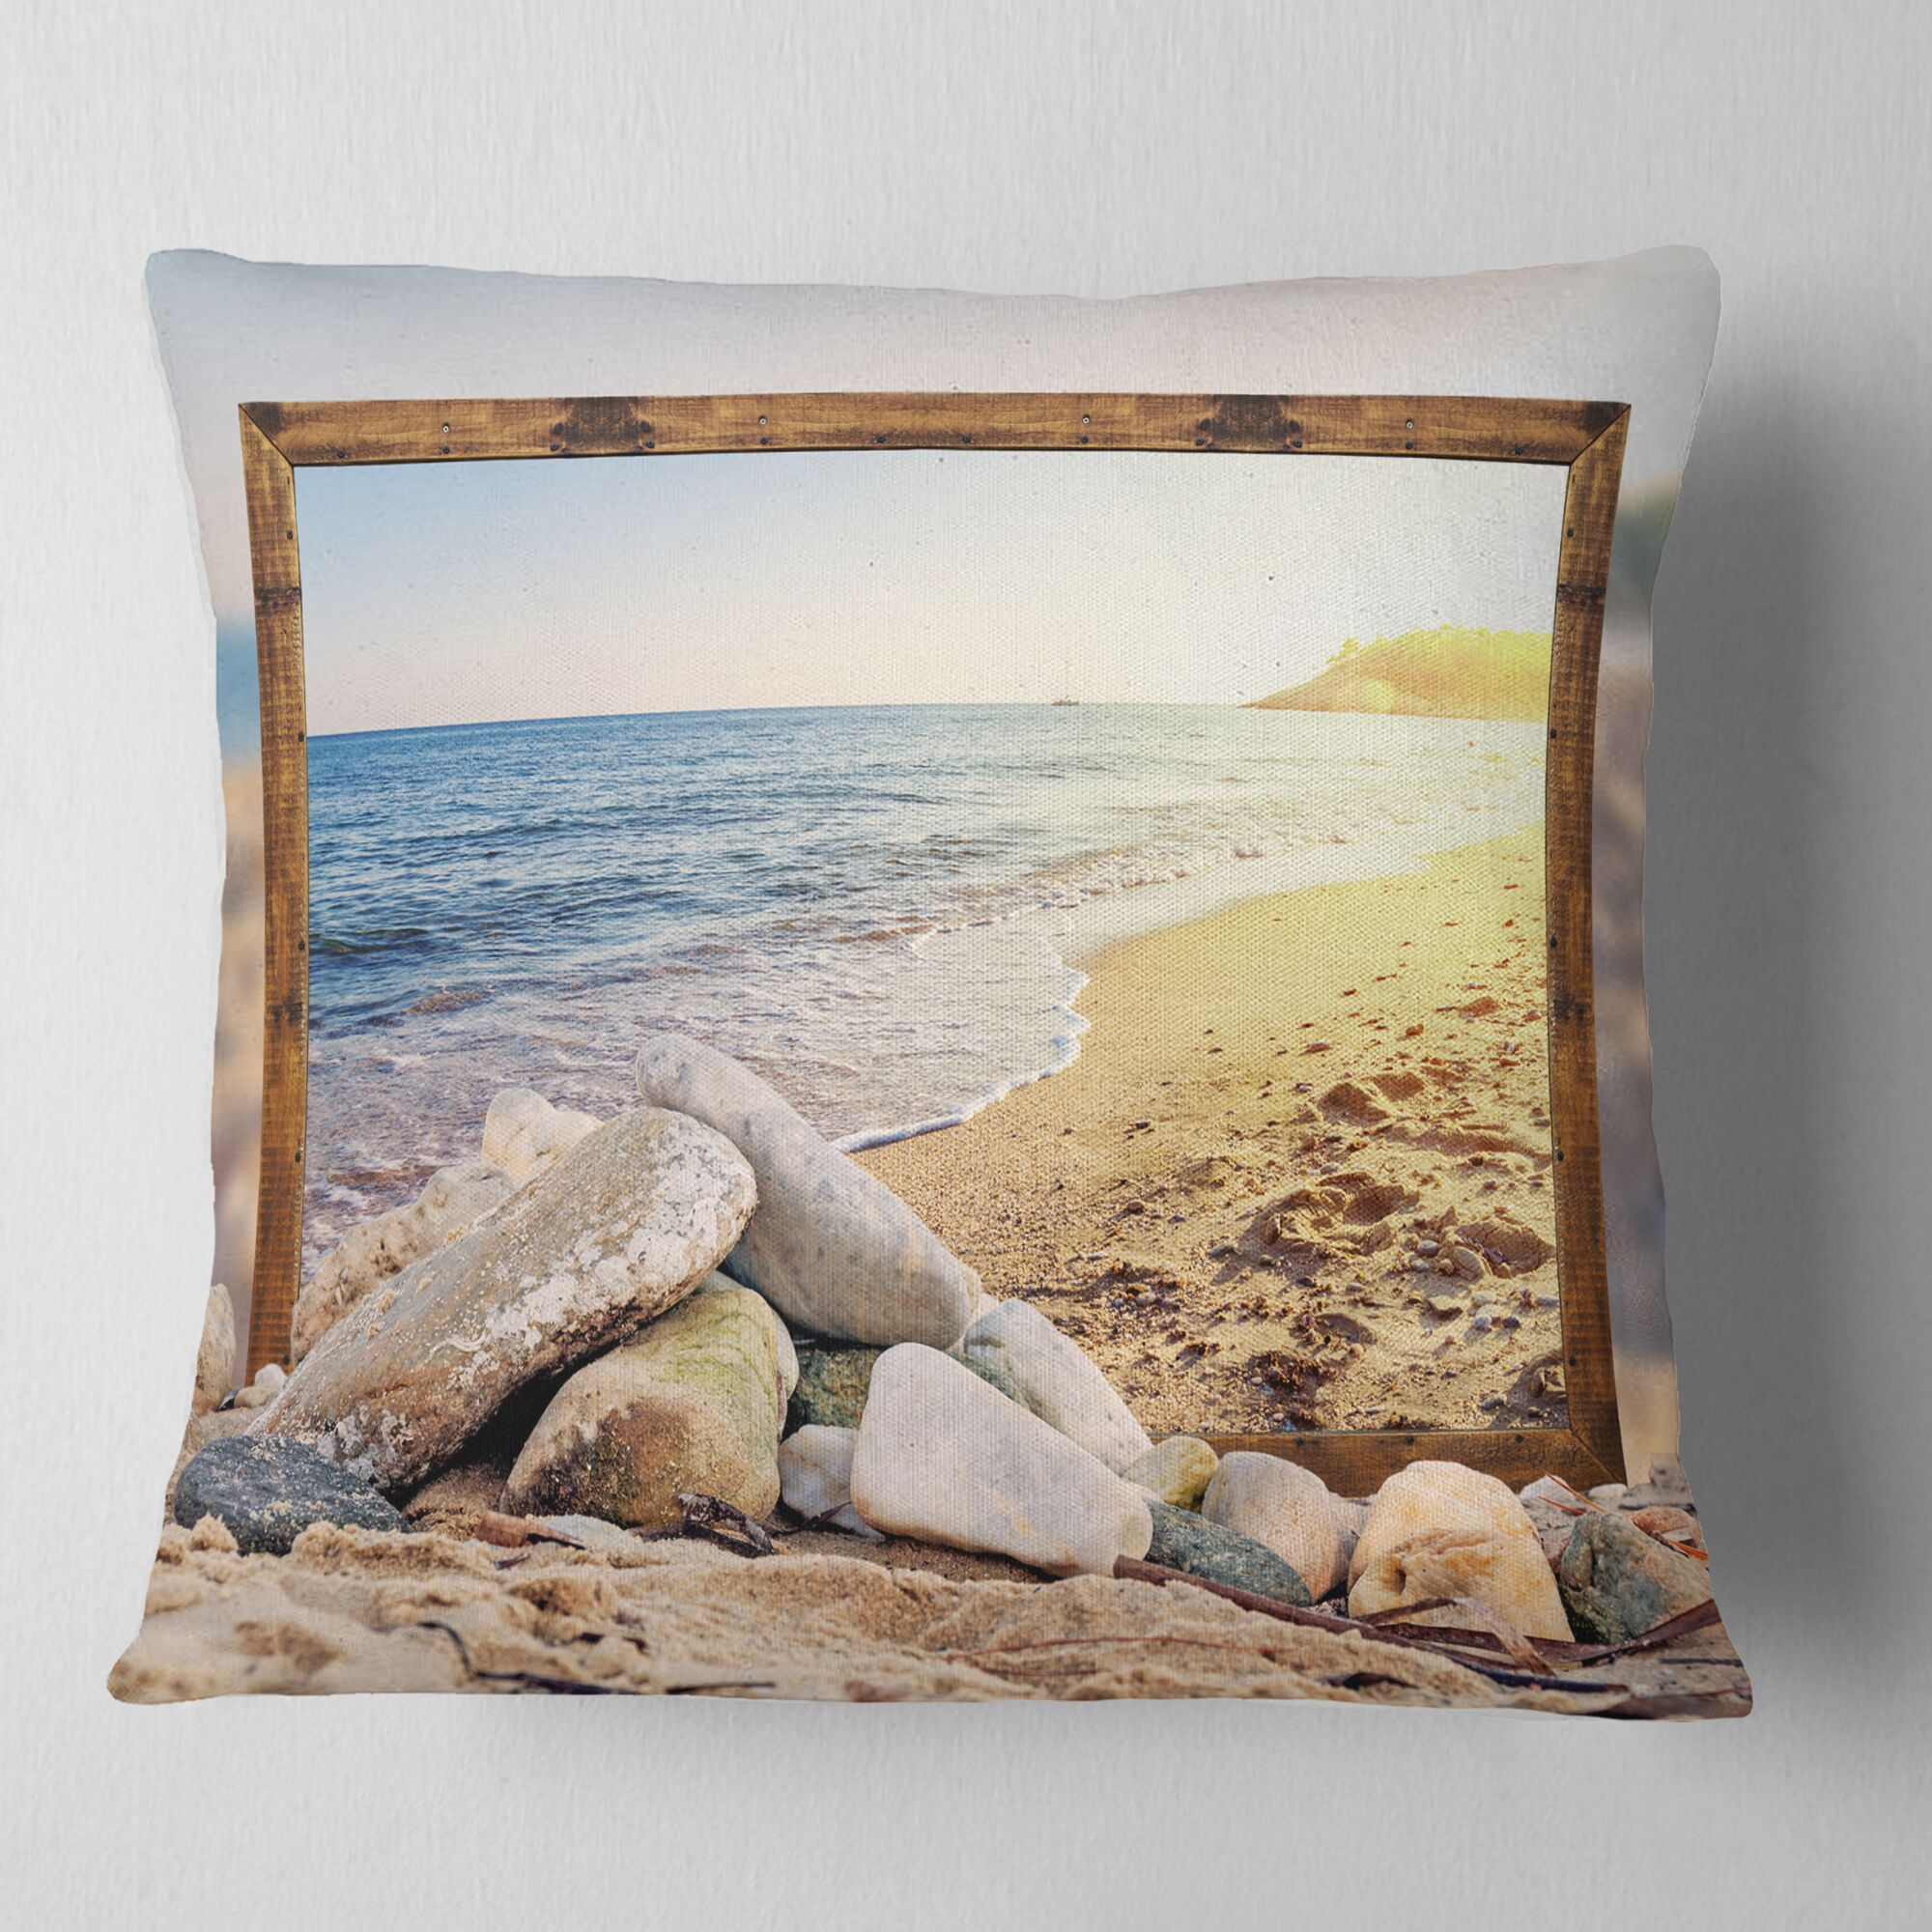 Framed Effect Beach Rocks Seashore Pillow Size: 26